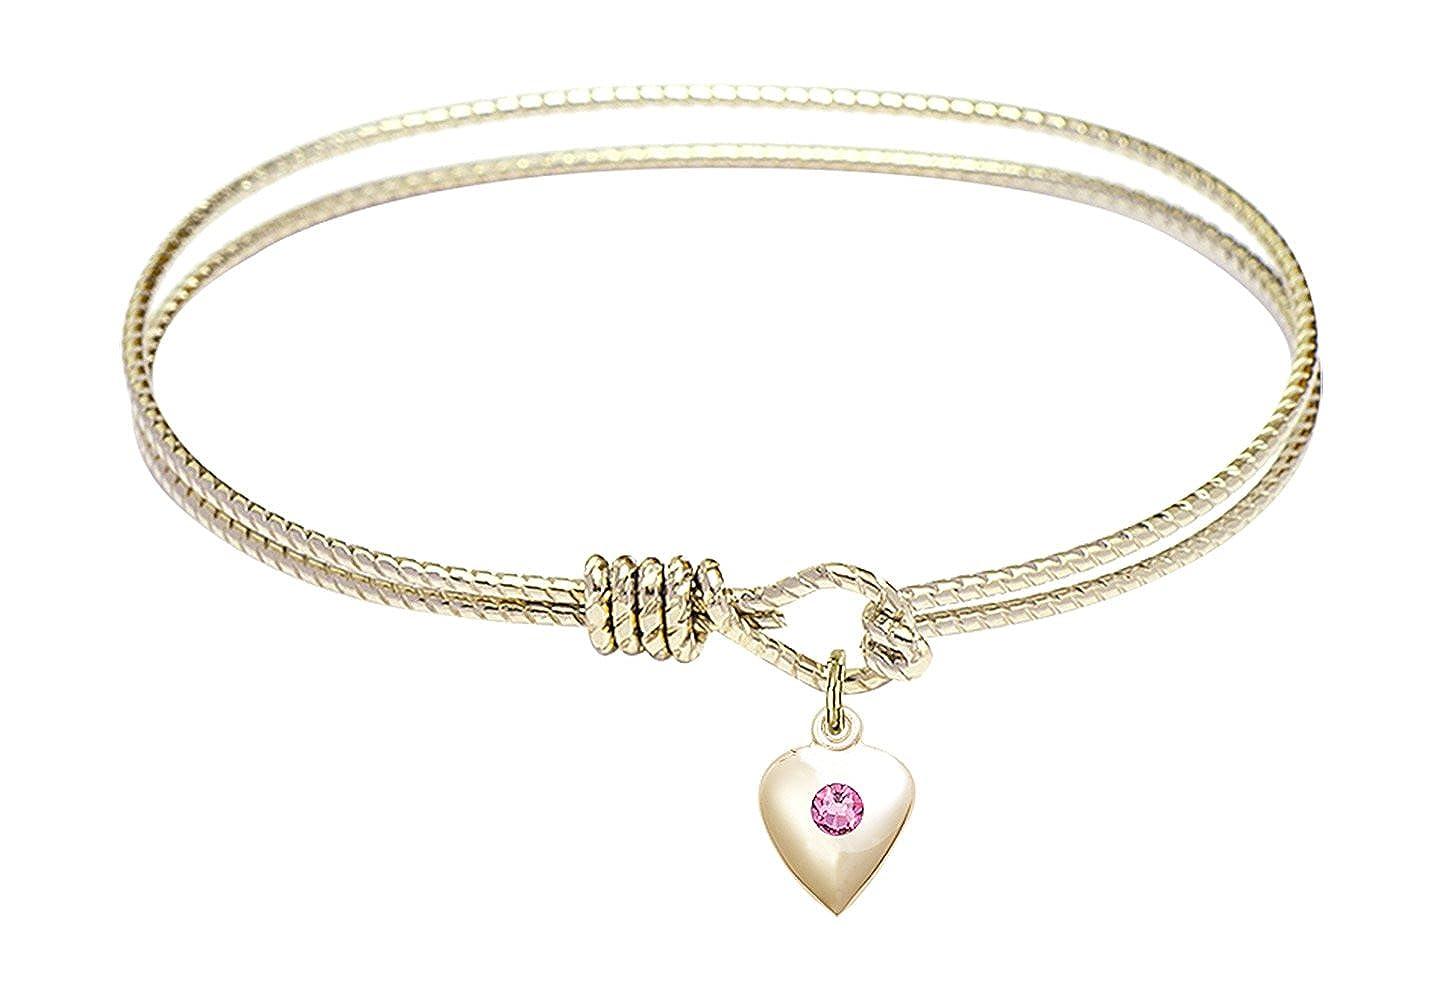 Heart Charm On A 7 1//4 Inch Oval Eye Hook Bangle Bracelet